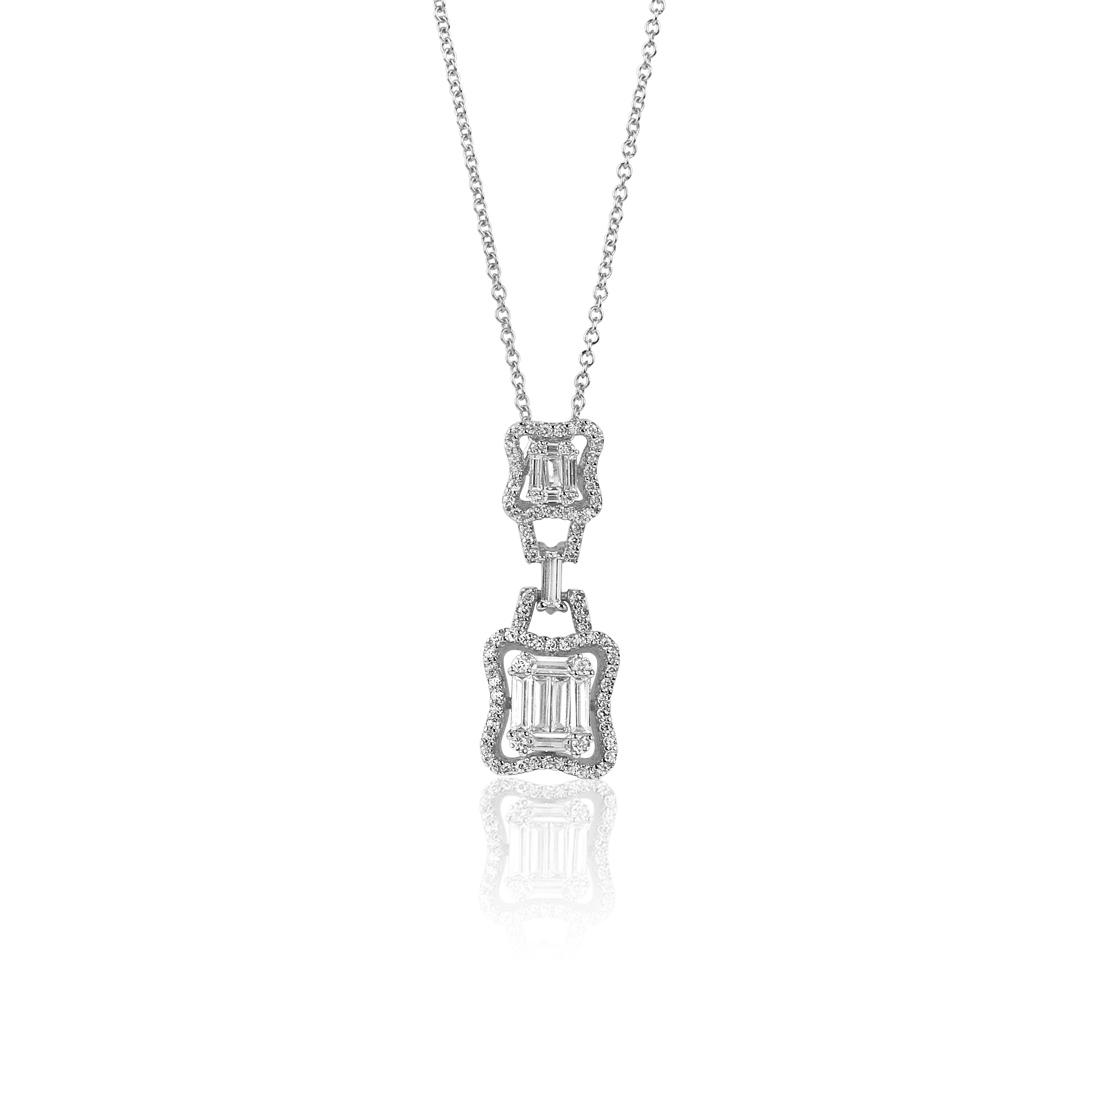 Allegra Silver Necklace - High Street Jewelry